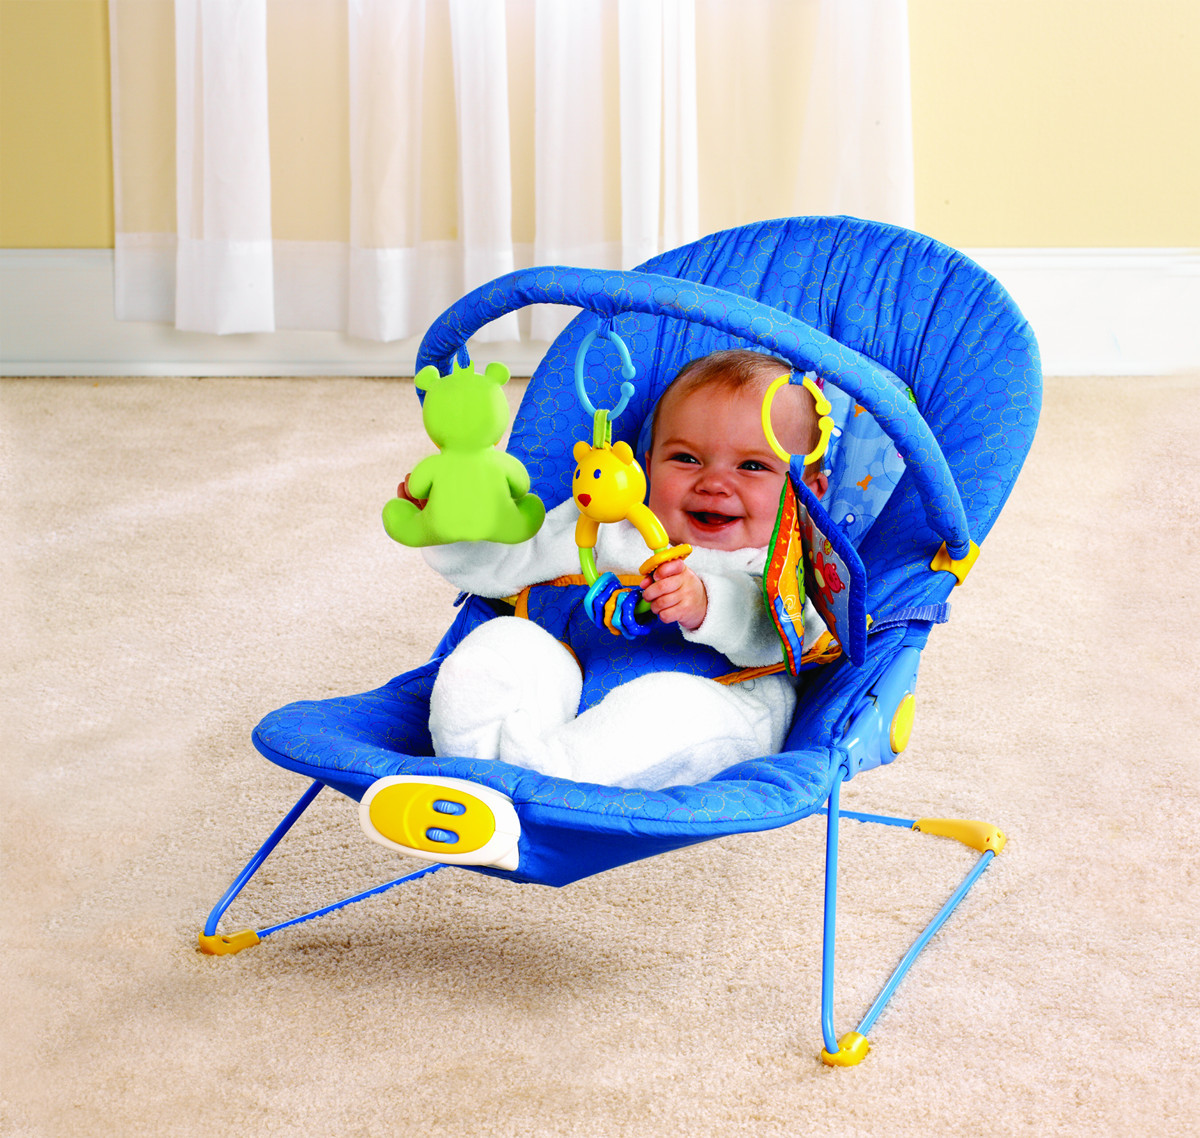 Multifunctional baby rocking chairinBouncersJumpers